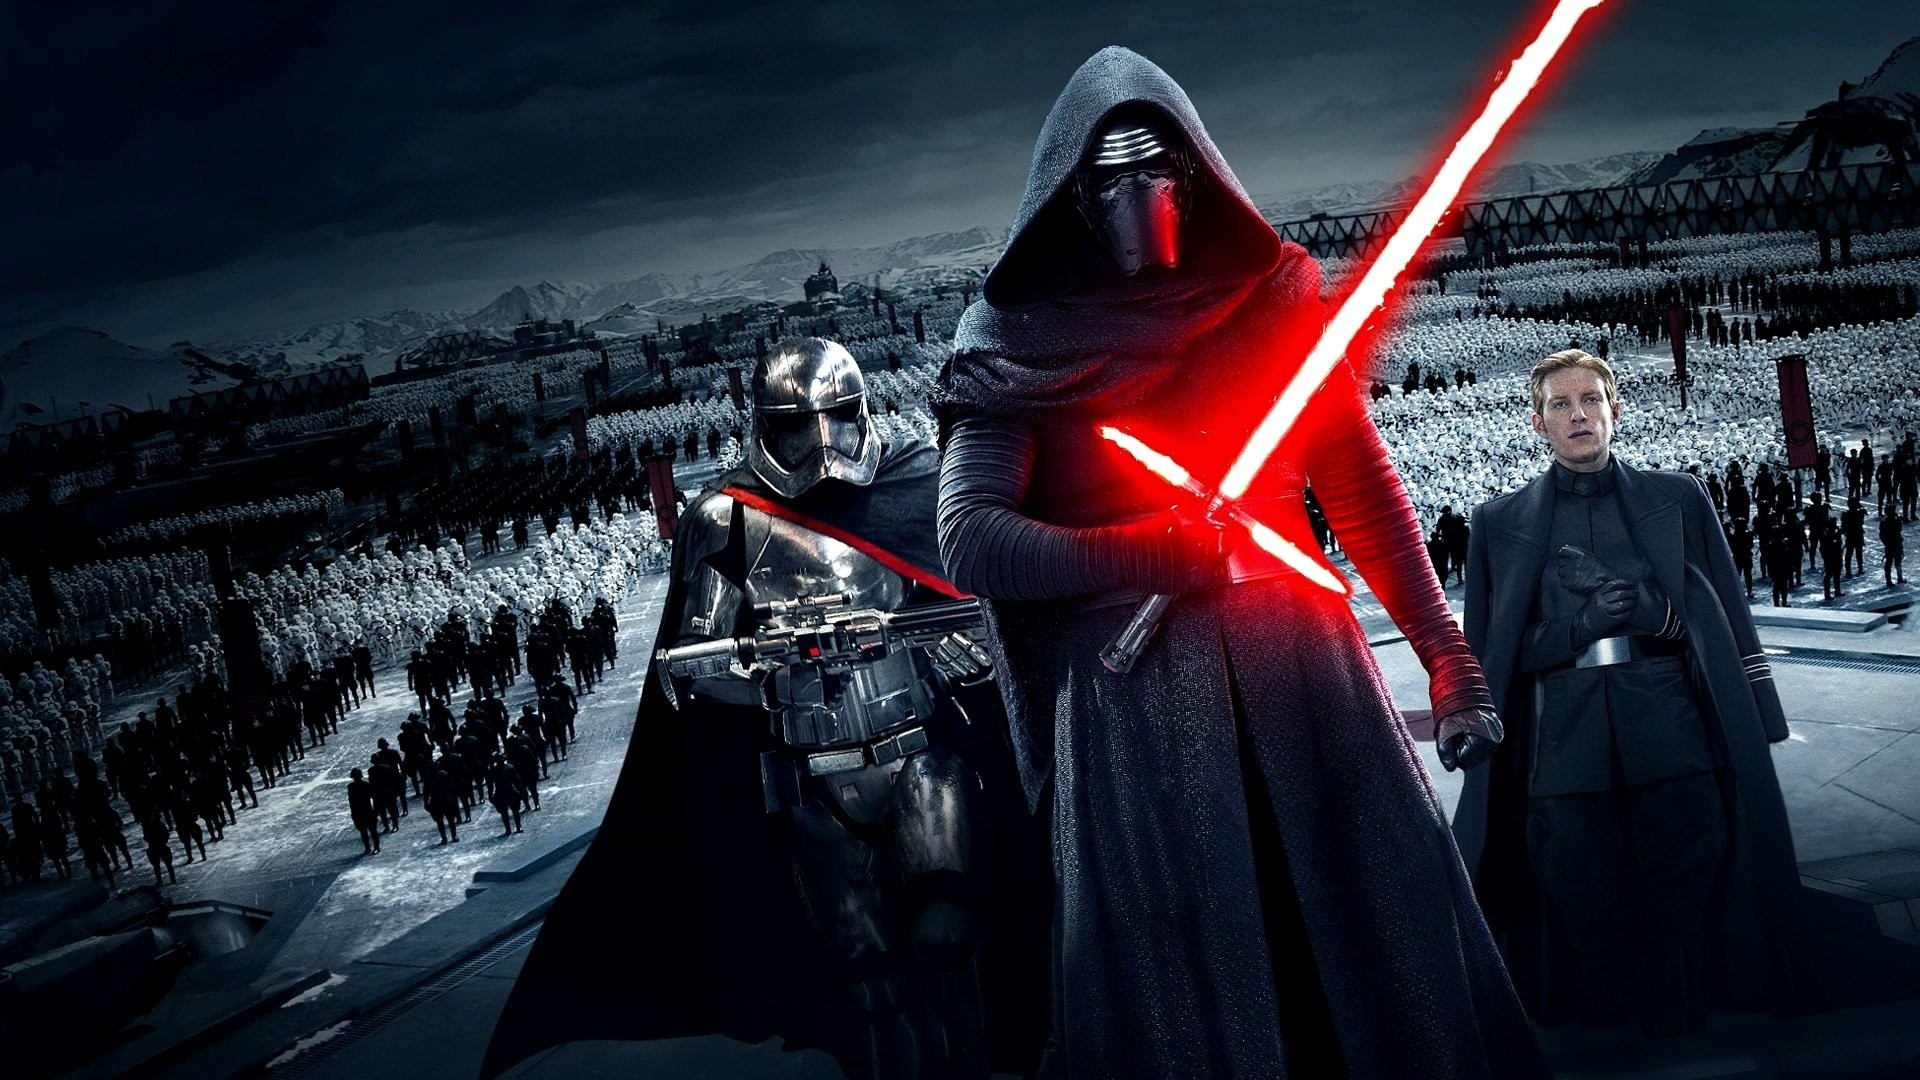 Stormtrooper Star Wars Wallpapers 64 Pictures